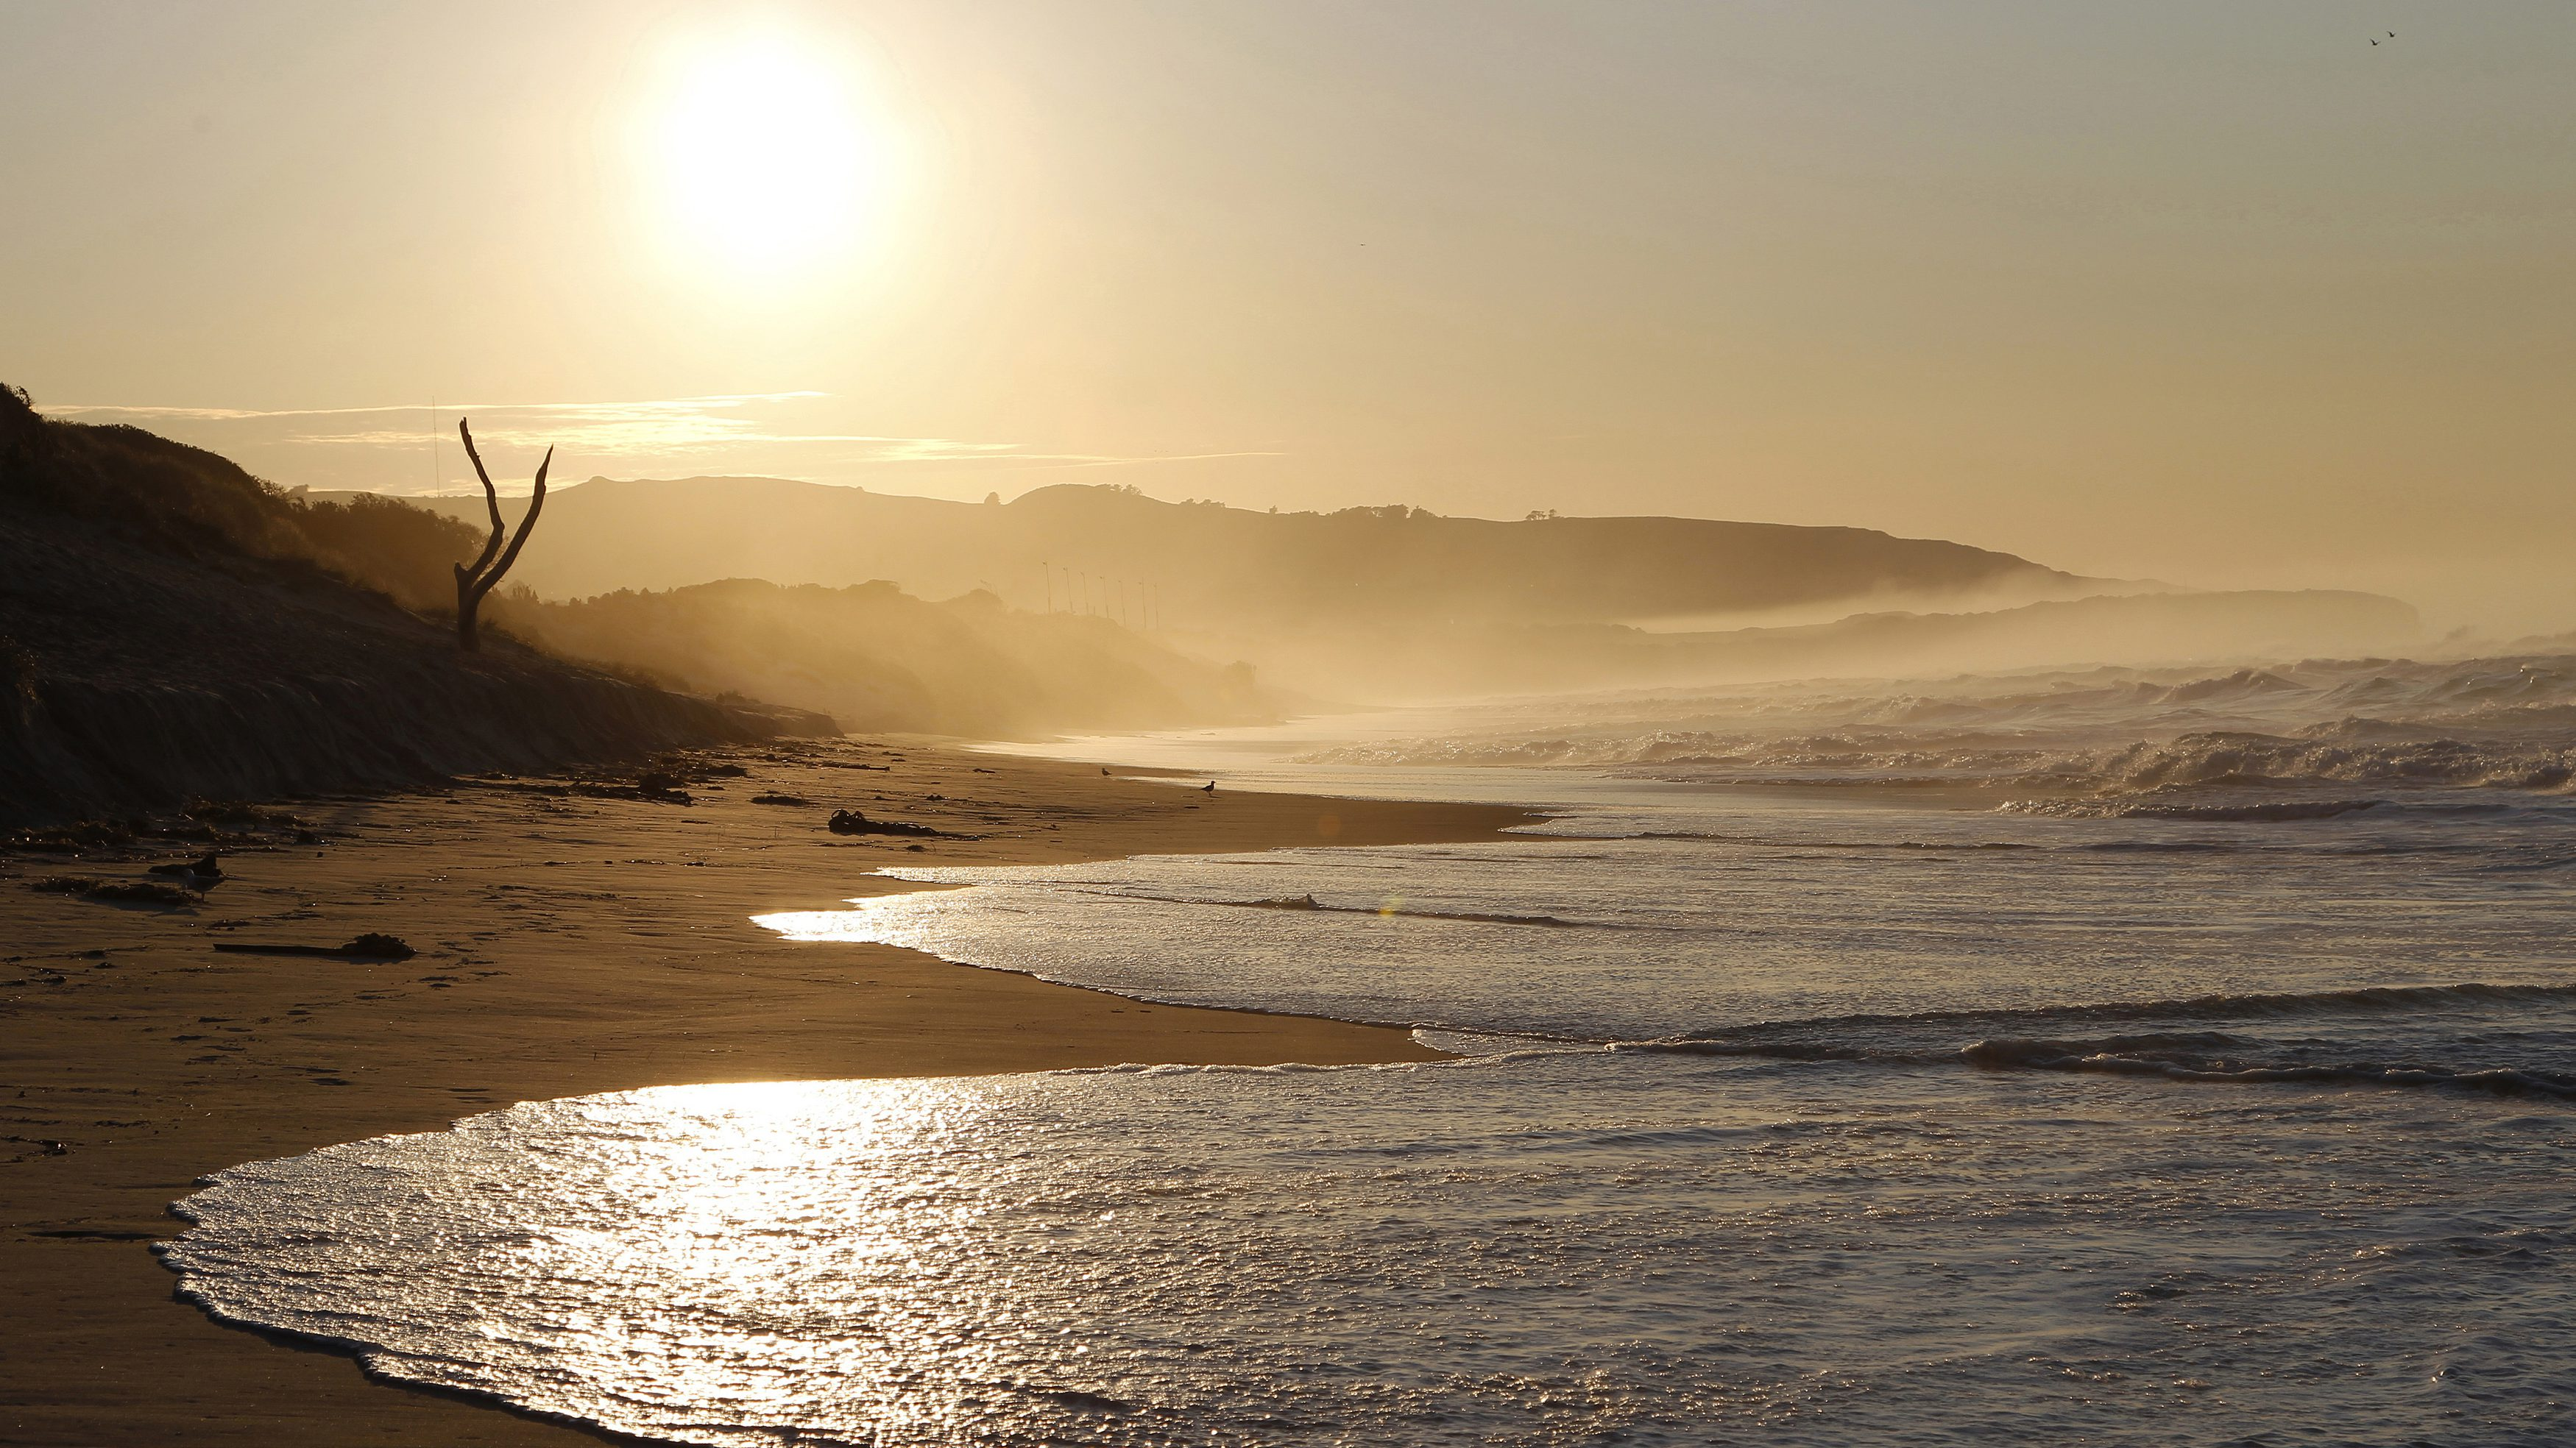 The sun rises over St. Clair beach in Dunedin September 5, 2011.